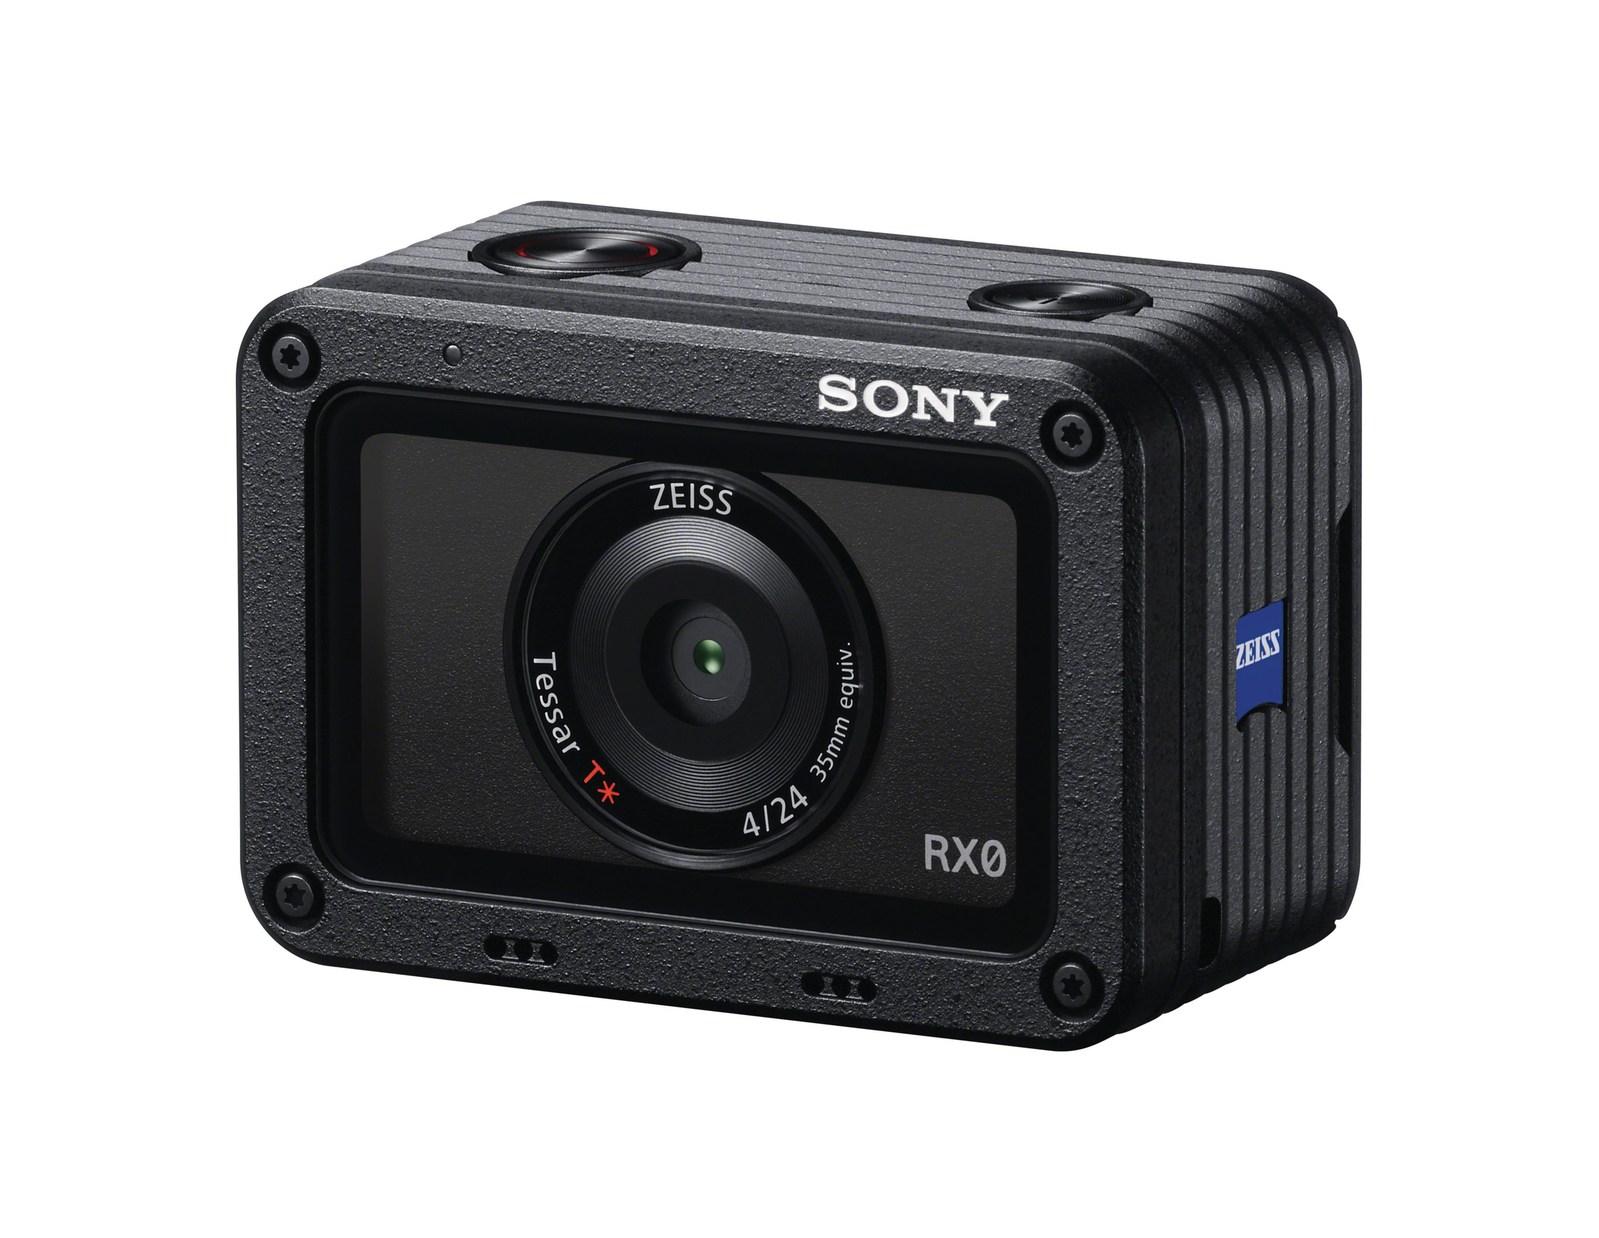 Sony ActionCam RX0